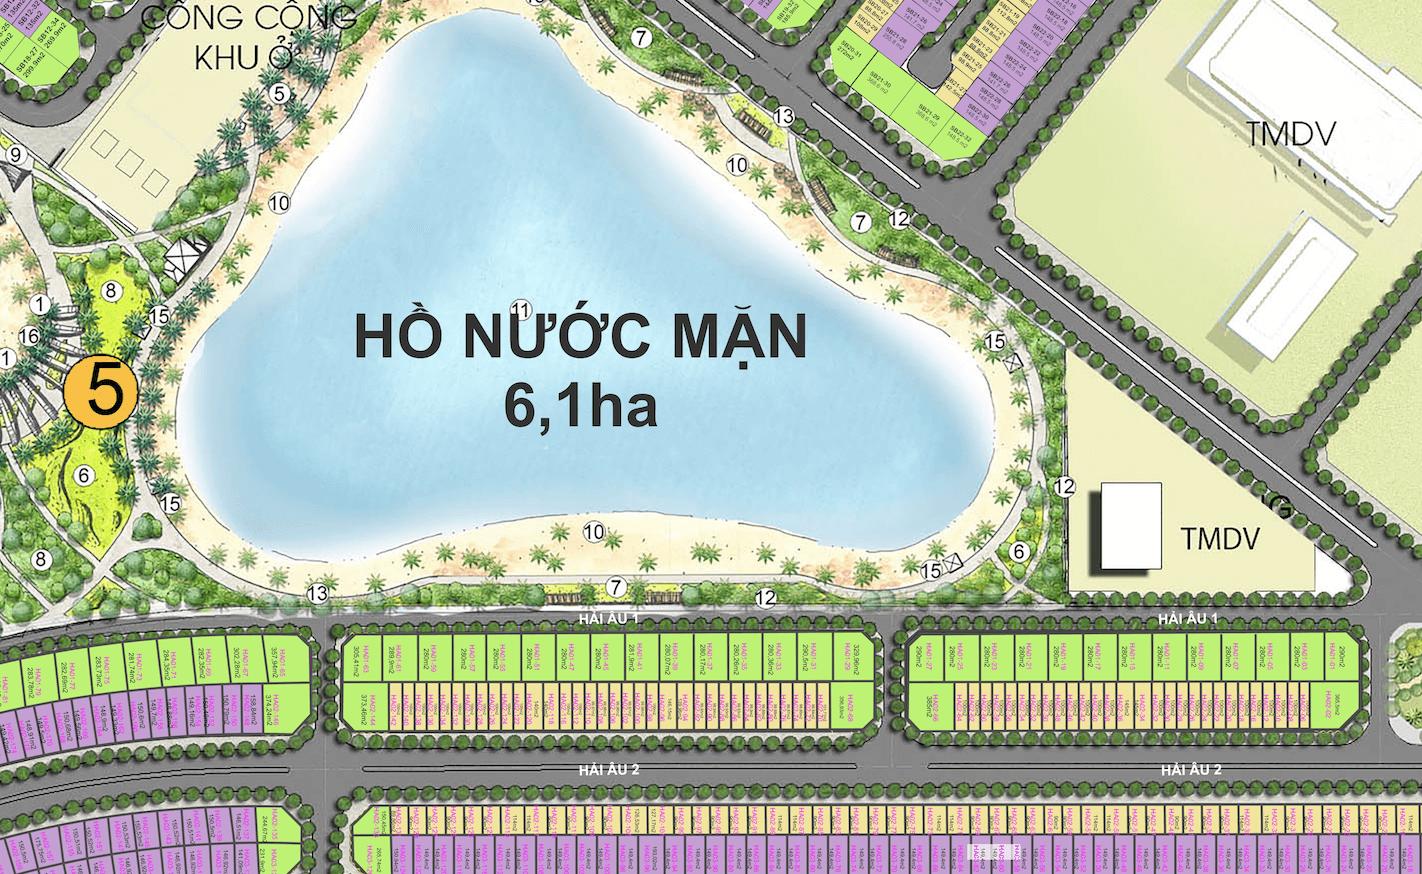 mat-bang-shophouse-hai-au-02-vincity-gia-lam-ocean-park-1